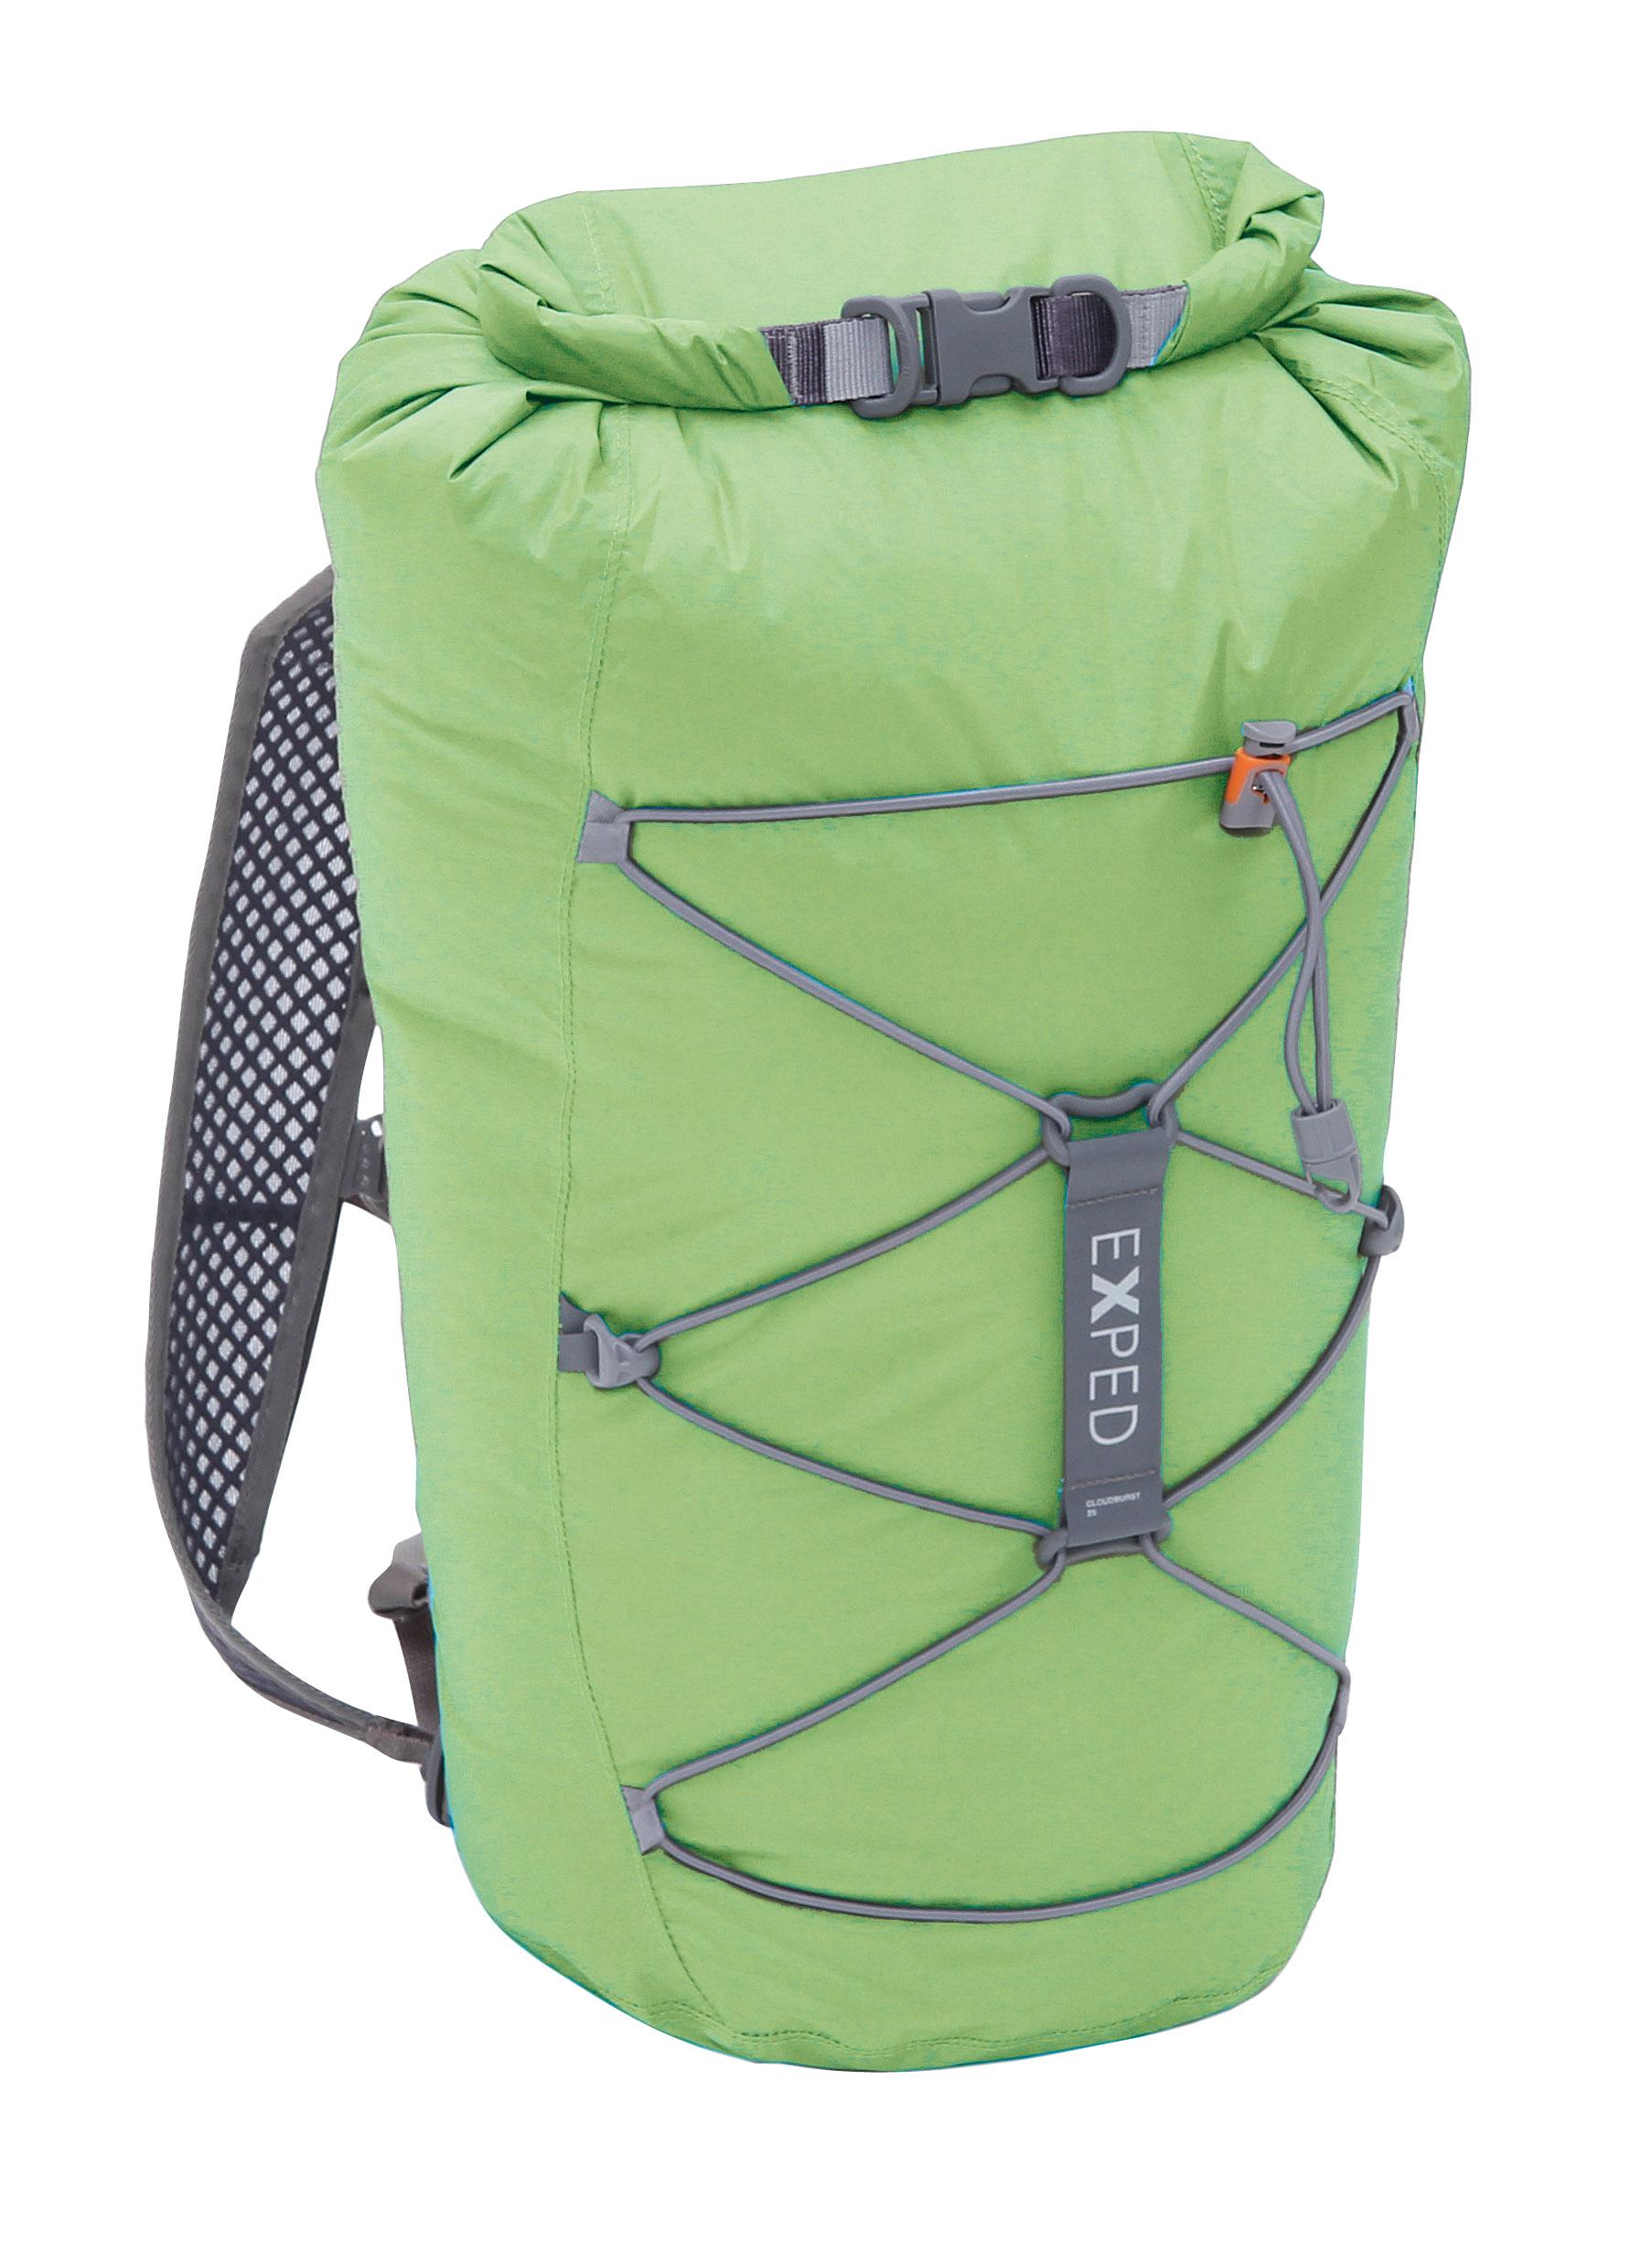 New Exped Fold Drybag 40L Equipment Travel Bag Pack Daypack